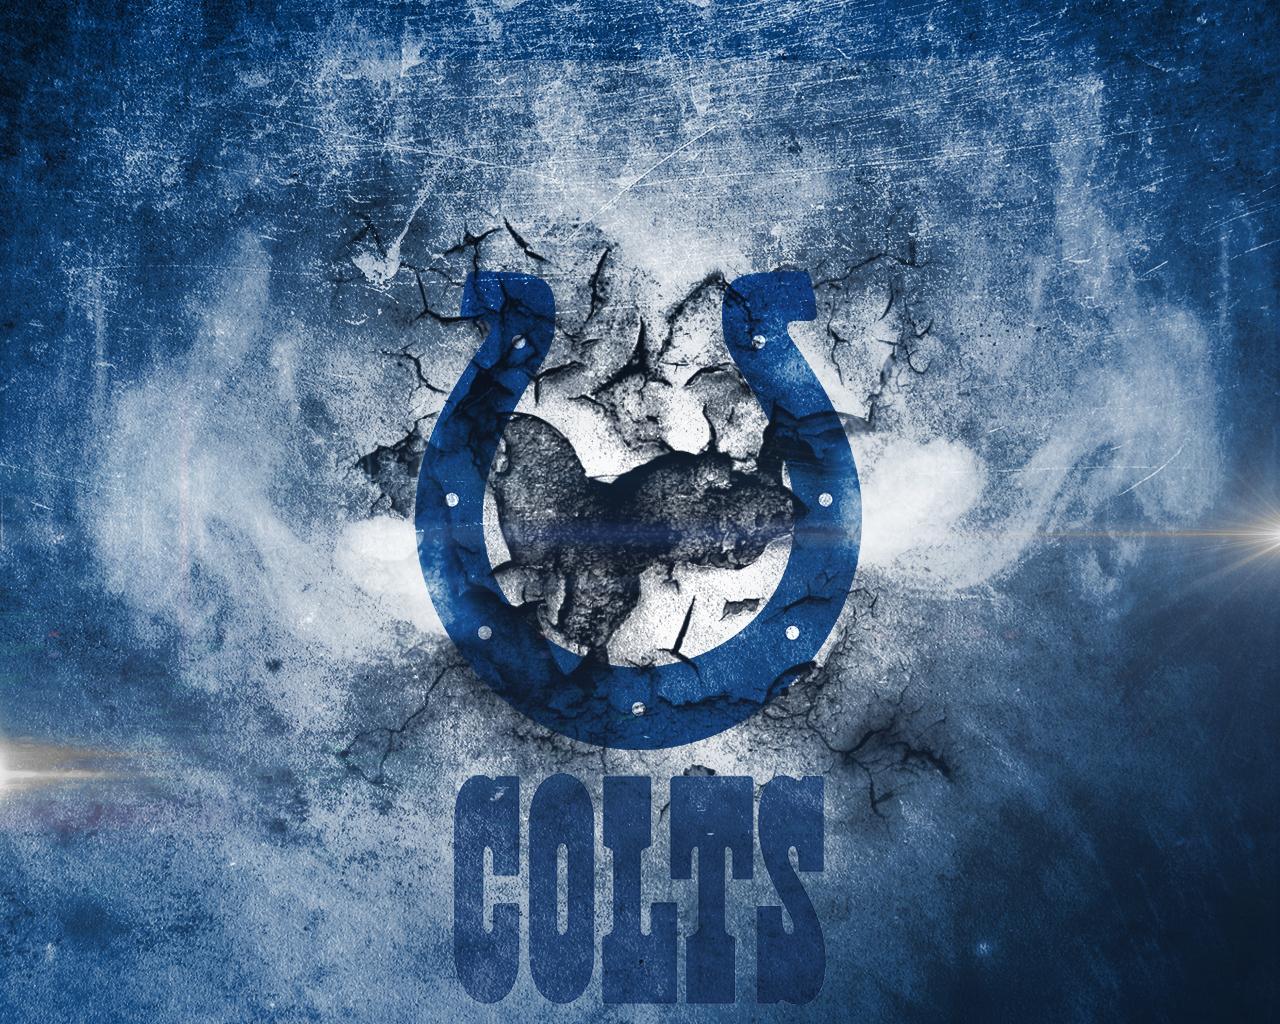 Indianapolis Colts wallpaper wallpaper | Indianapolis Colts wallpapers